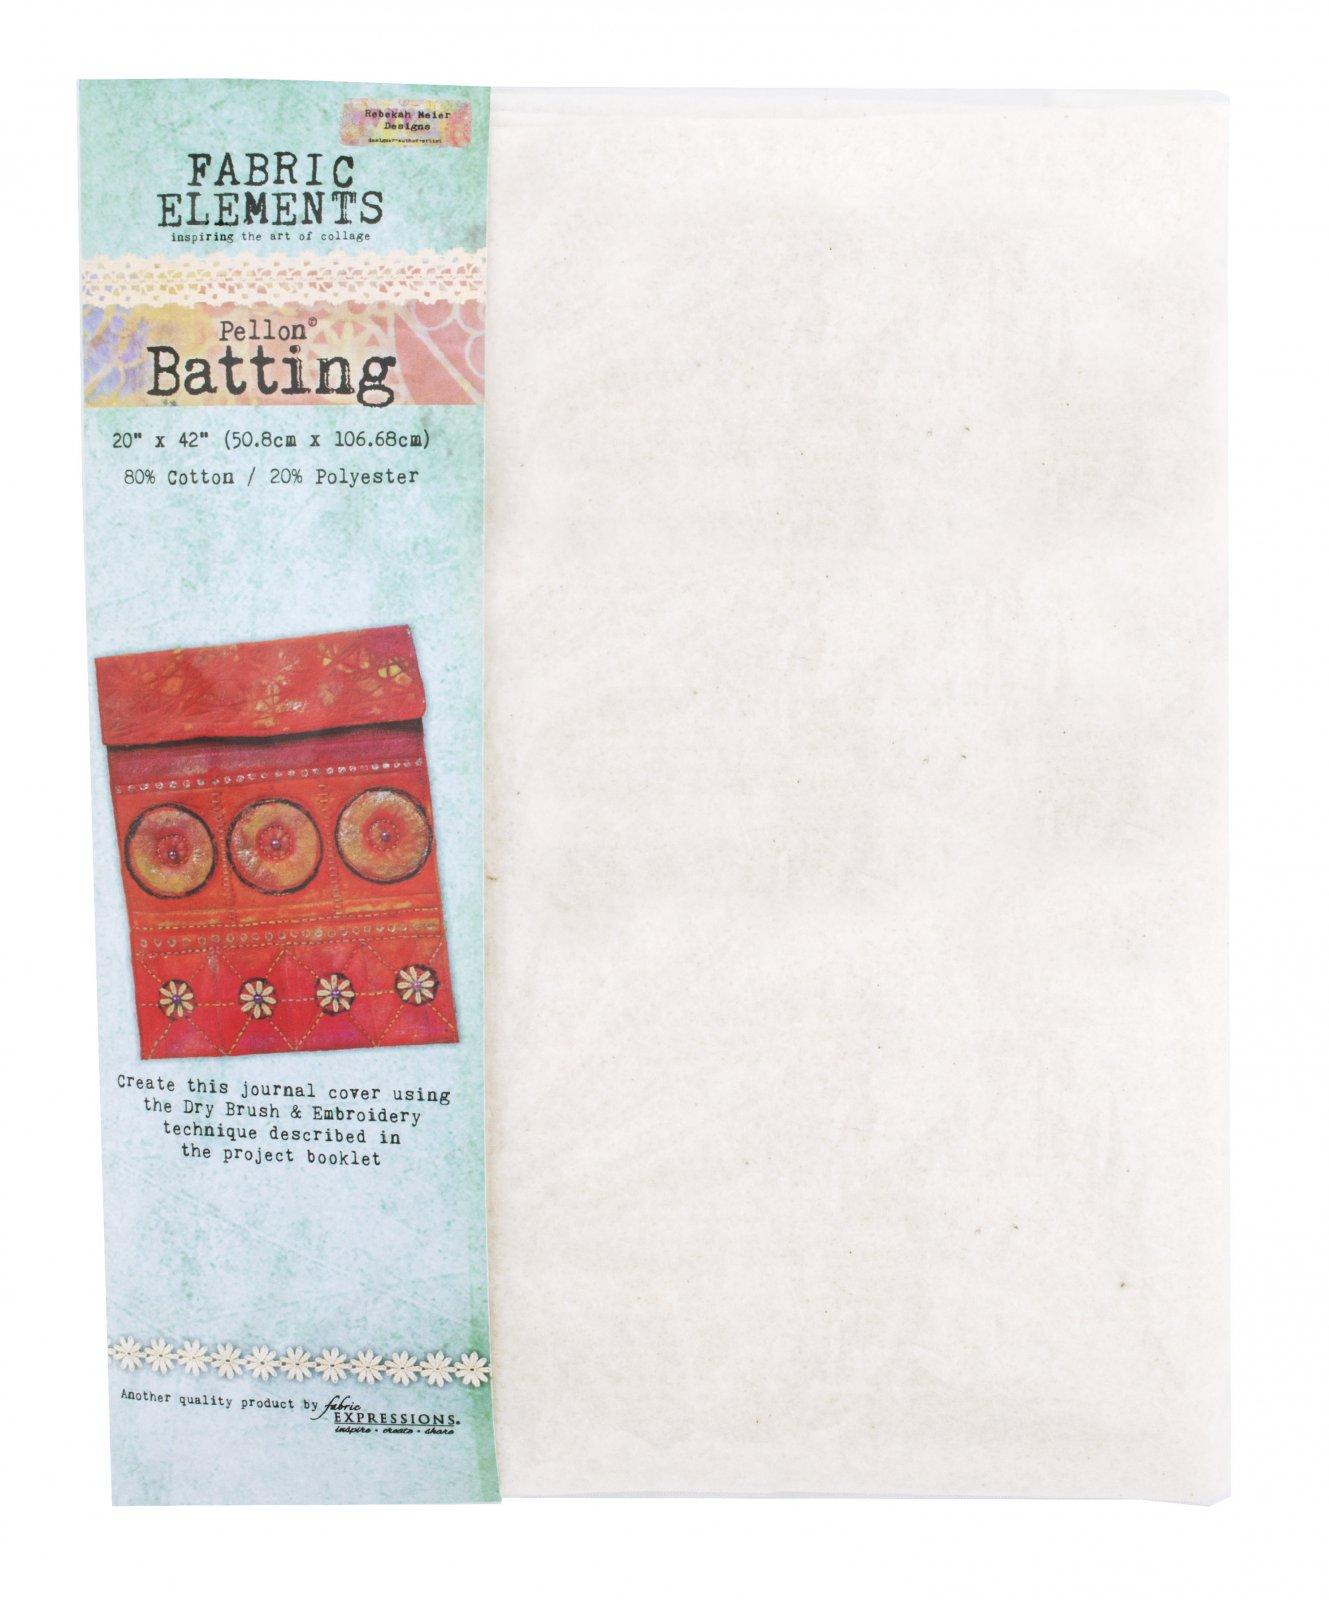 Fabric Elements Batting - Natural